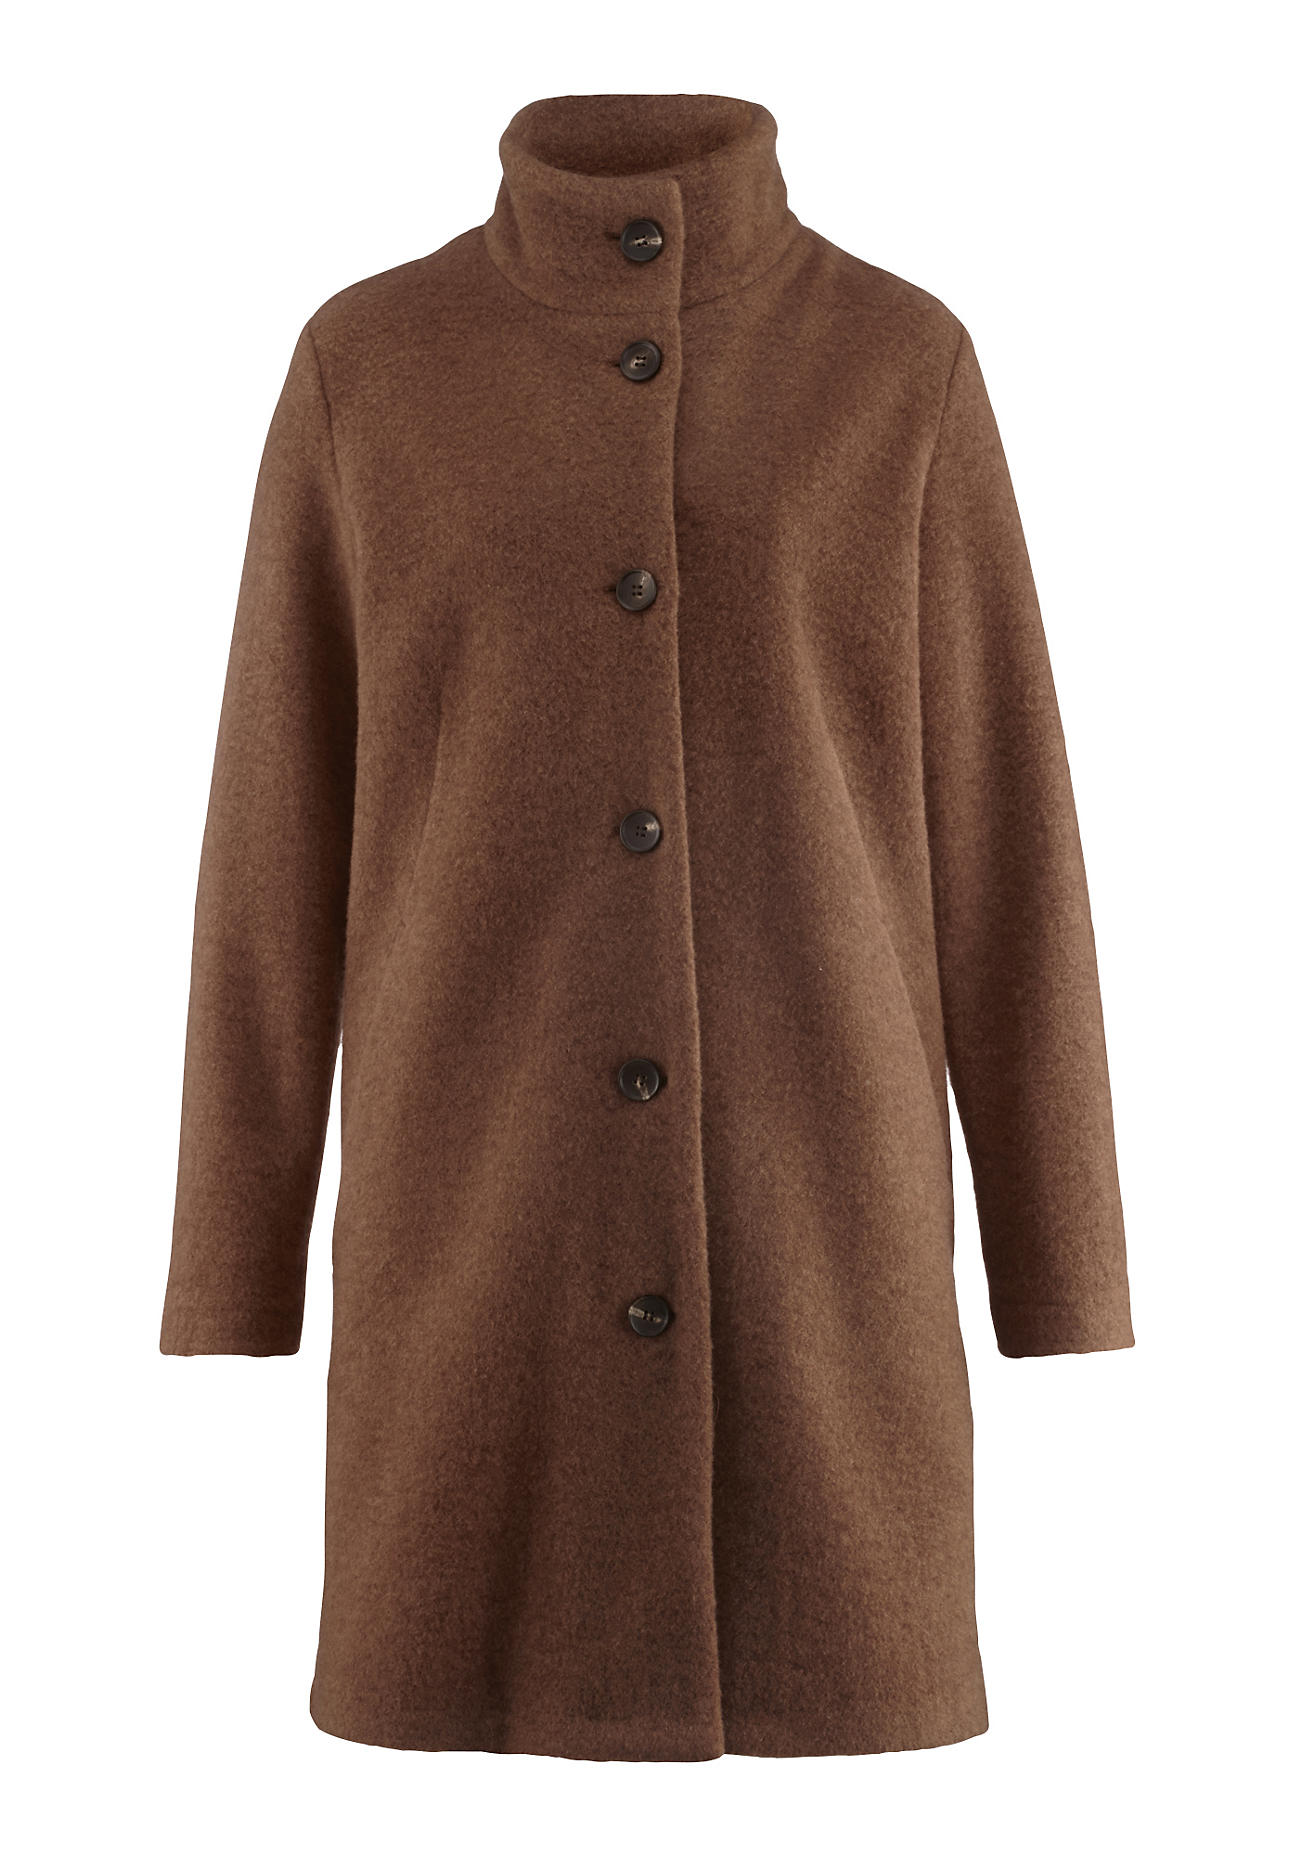 hessnatur Damen Wollfleece-Mantel aus Bio-Schurwolle – braun – Größe 42 | Sportbekleidung > Sportmäntel > Fleecemäntel | hessnatur